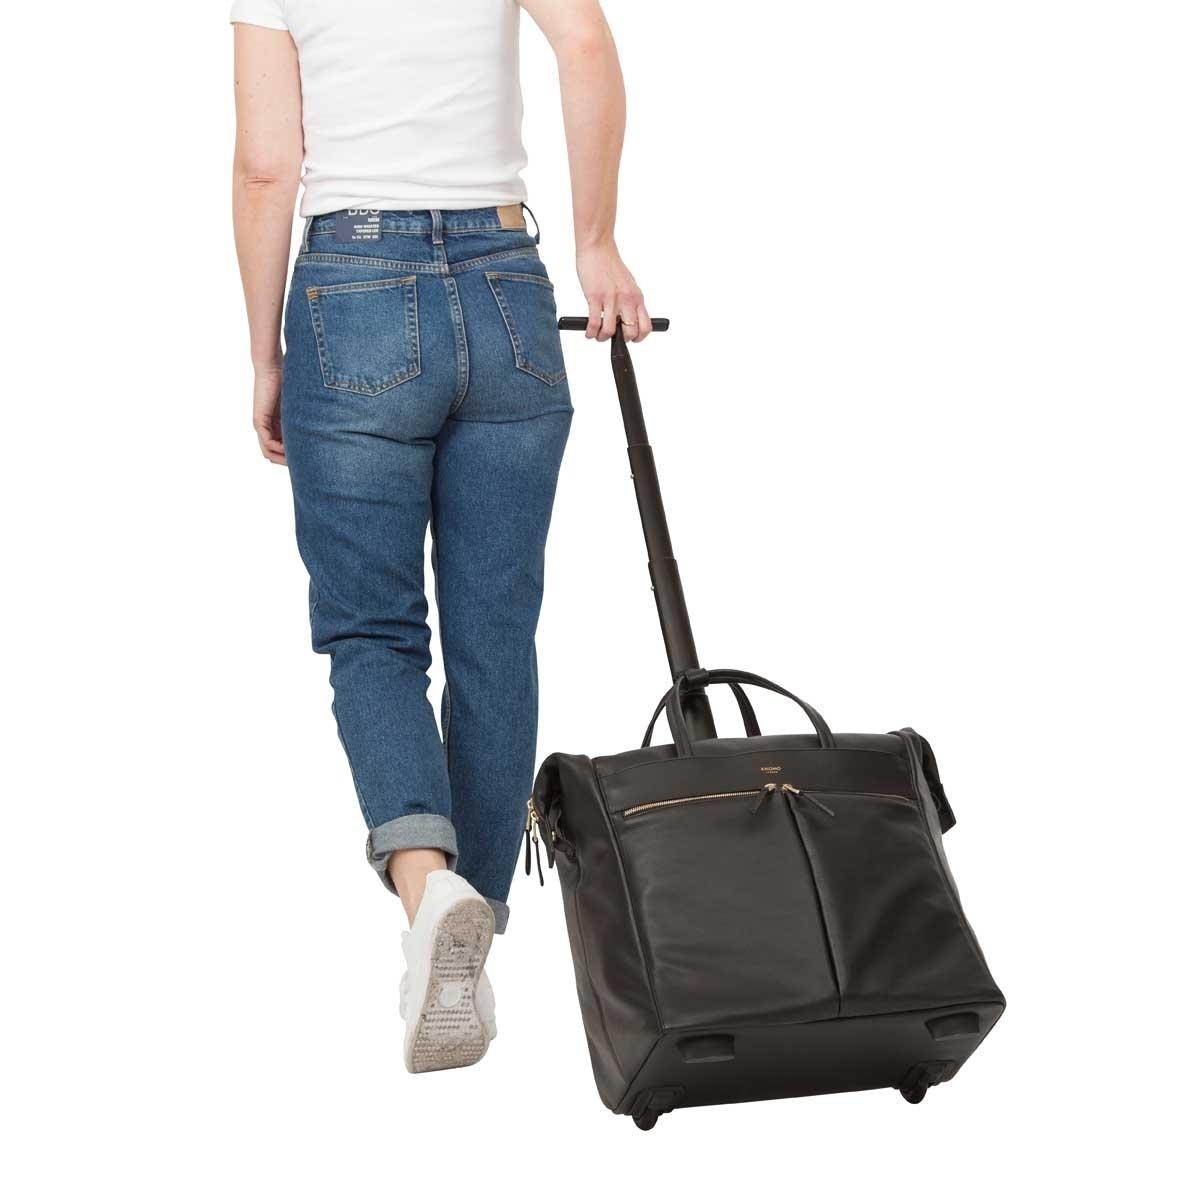 Knomo Luggage Women's Sedley Weekender Bag, Black, One Size